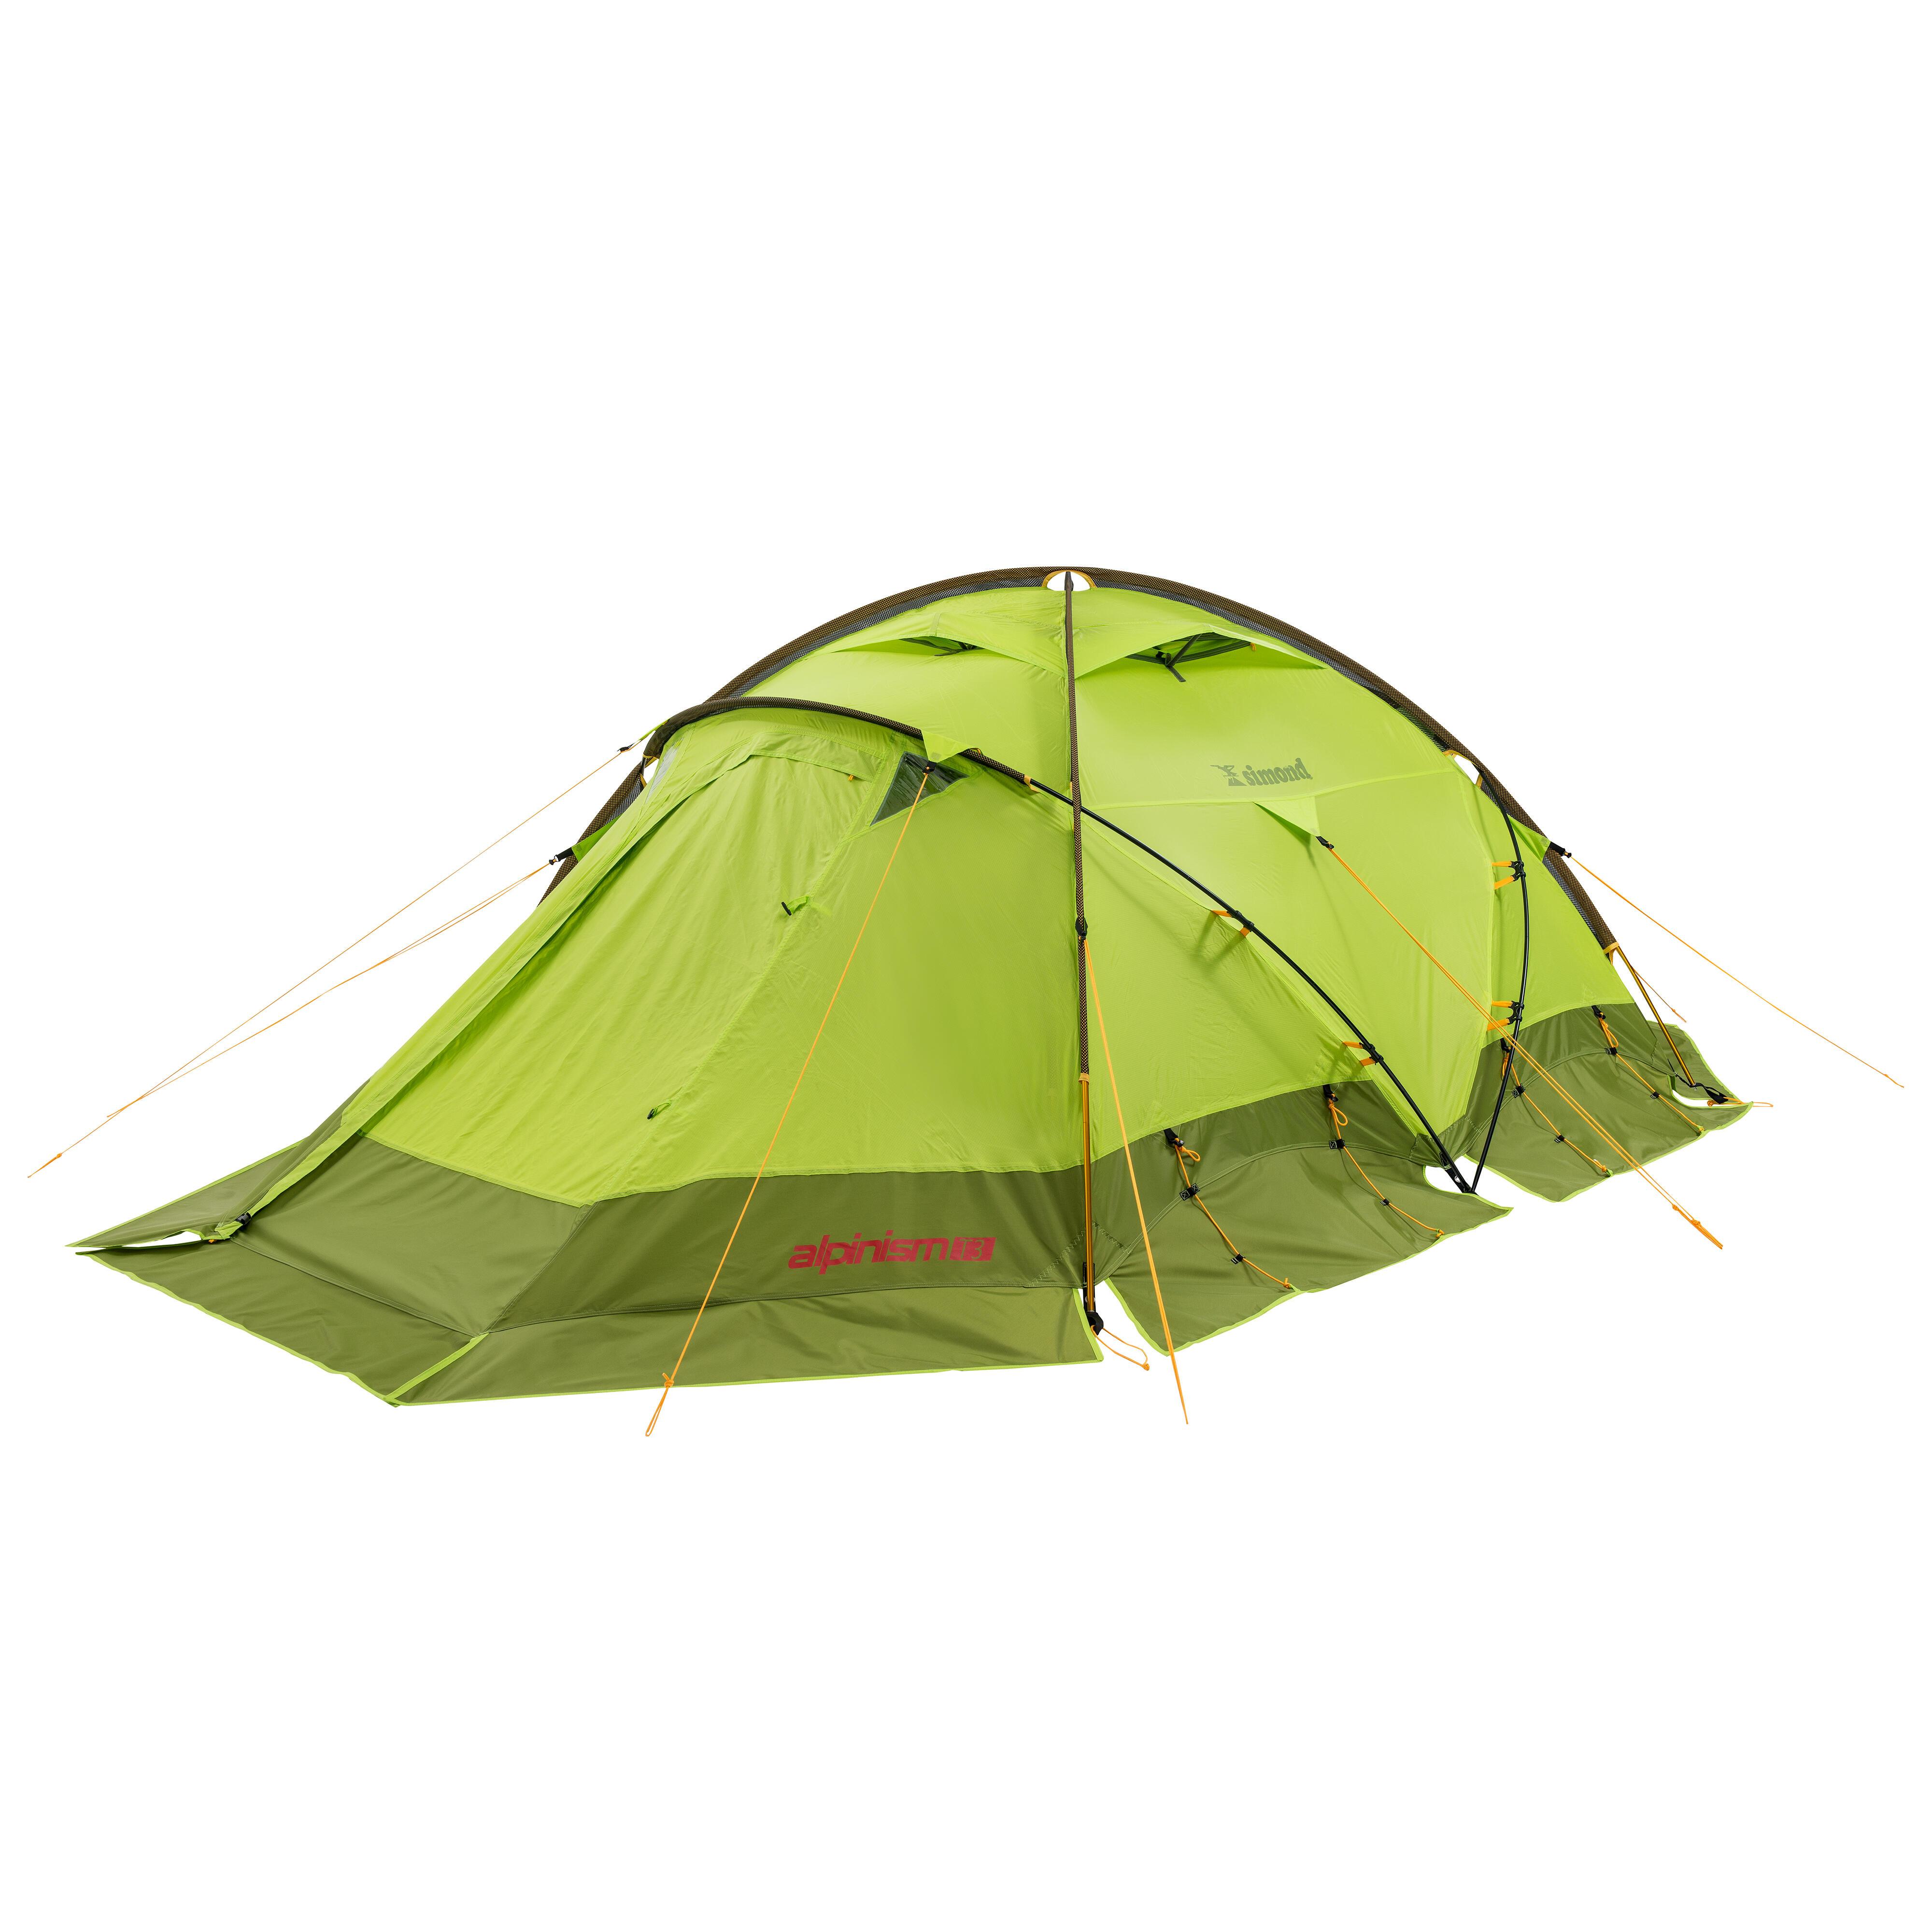 Simond Tent Makalu T3